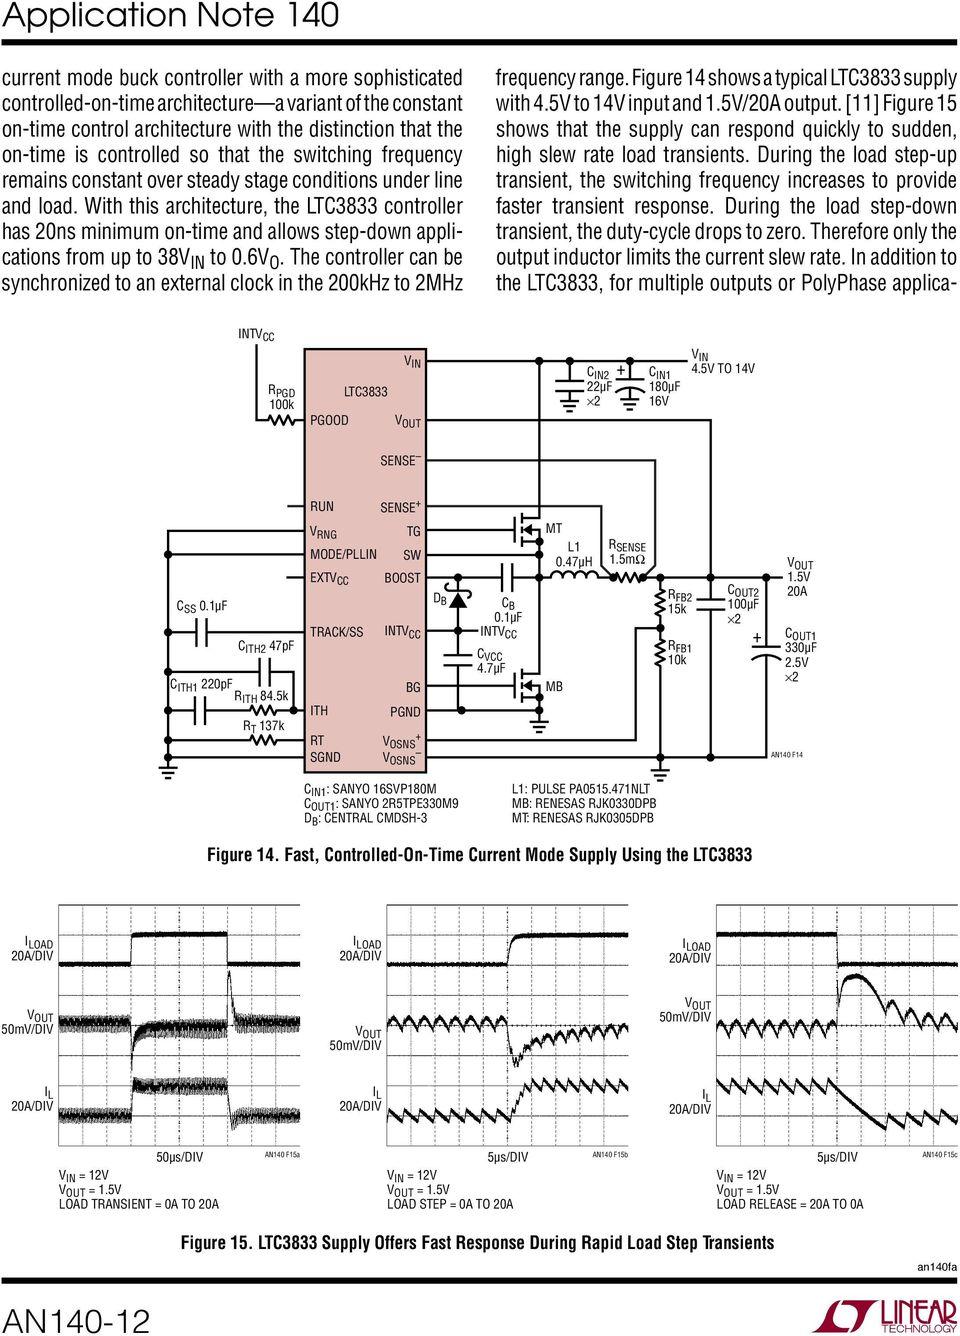 Amazing Basic Concepts Of Linear Regulator And Switching Mode Power Supplies Wiring Cloud Inklaidewilluminateatxorg